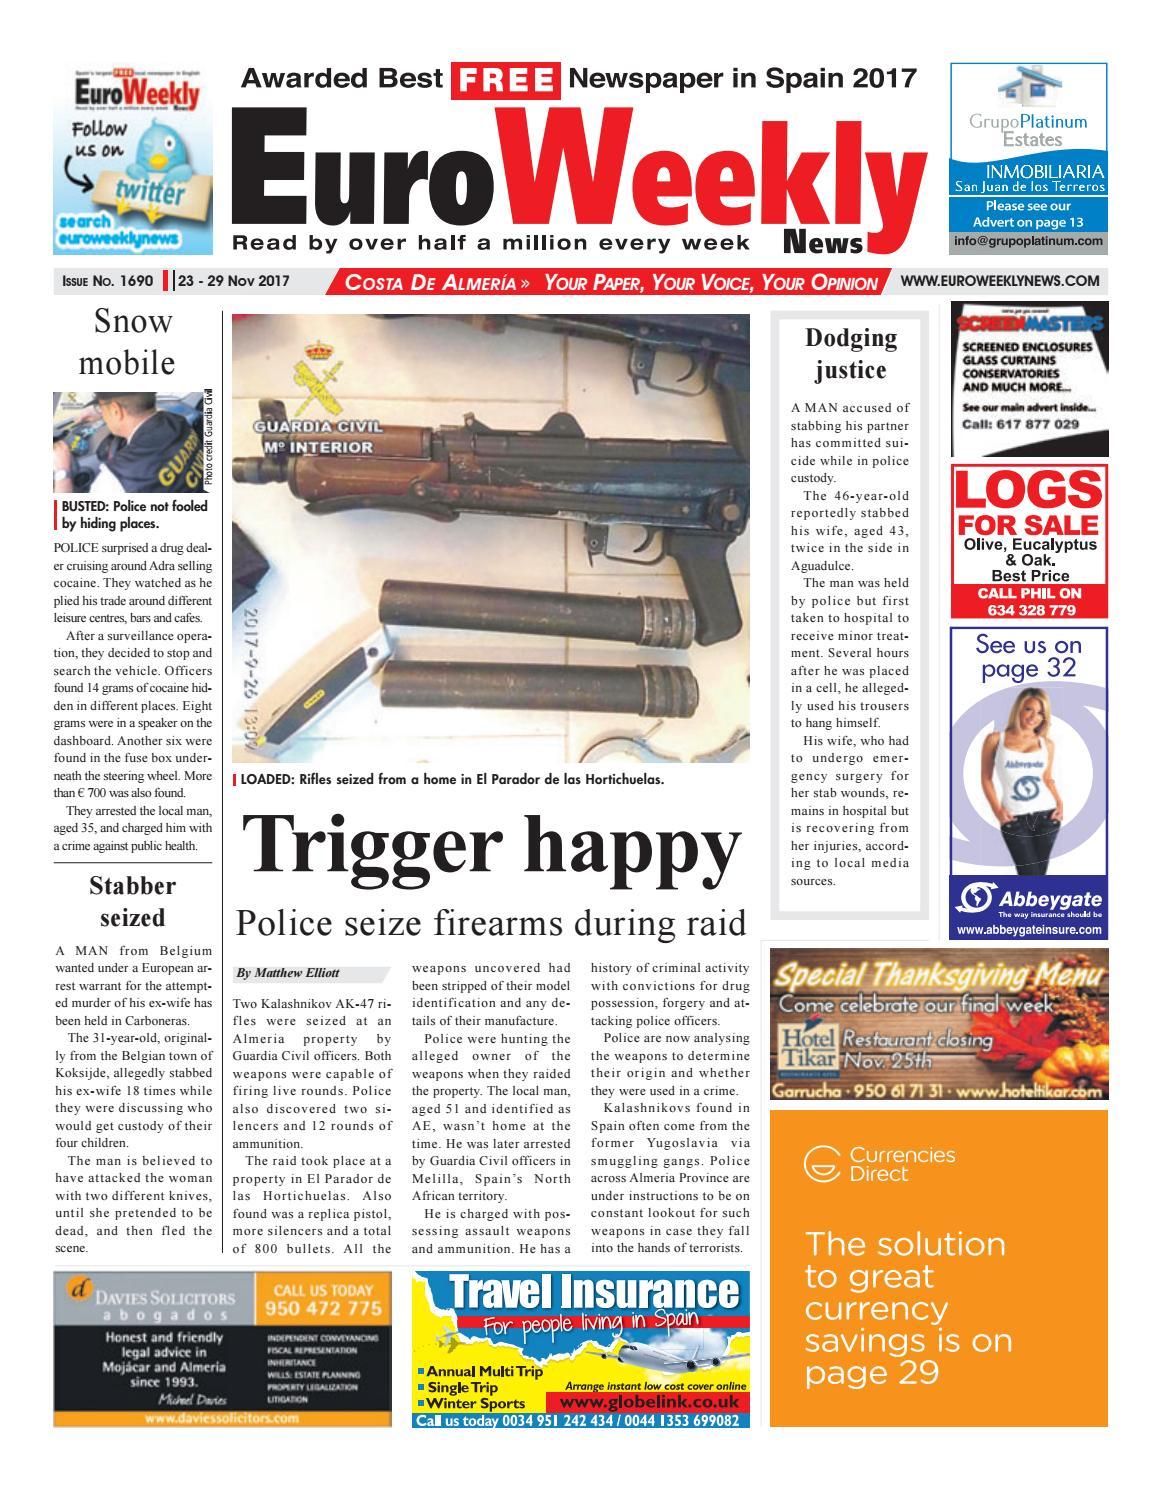 Euro Weekly News - Costa de Almeria 23 – 29 November 2017 Issue 1690 by  Euro Weekly News Media S.A. - issuu